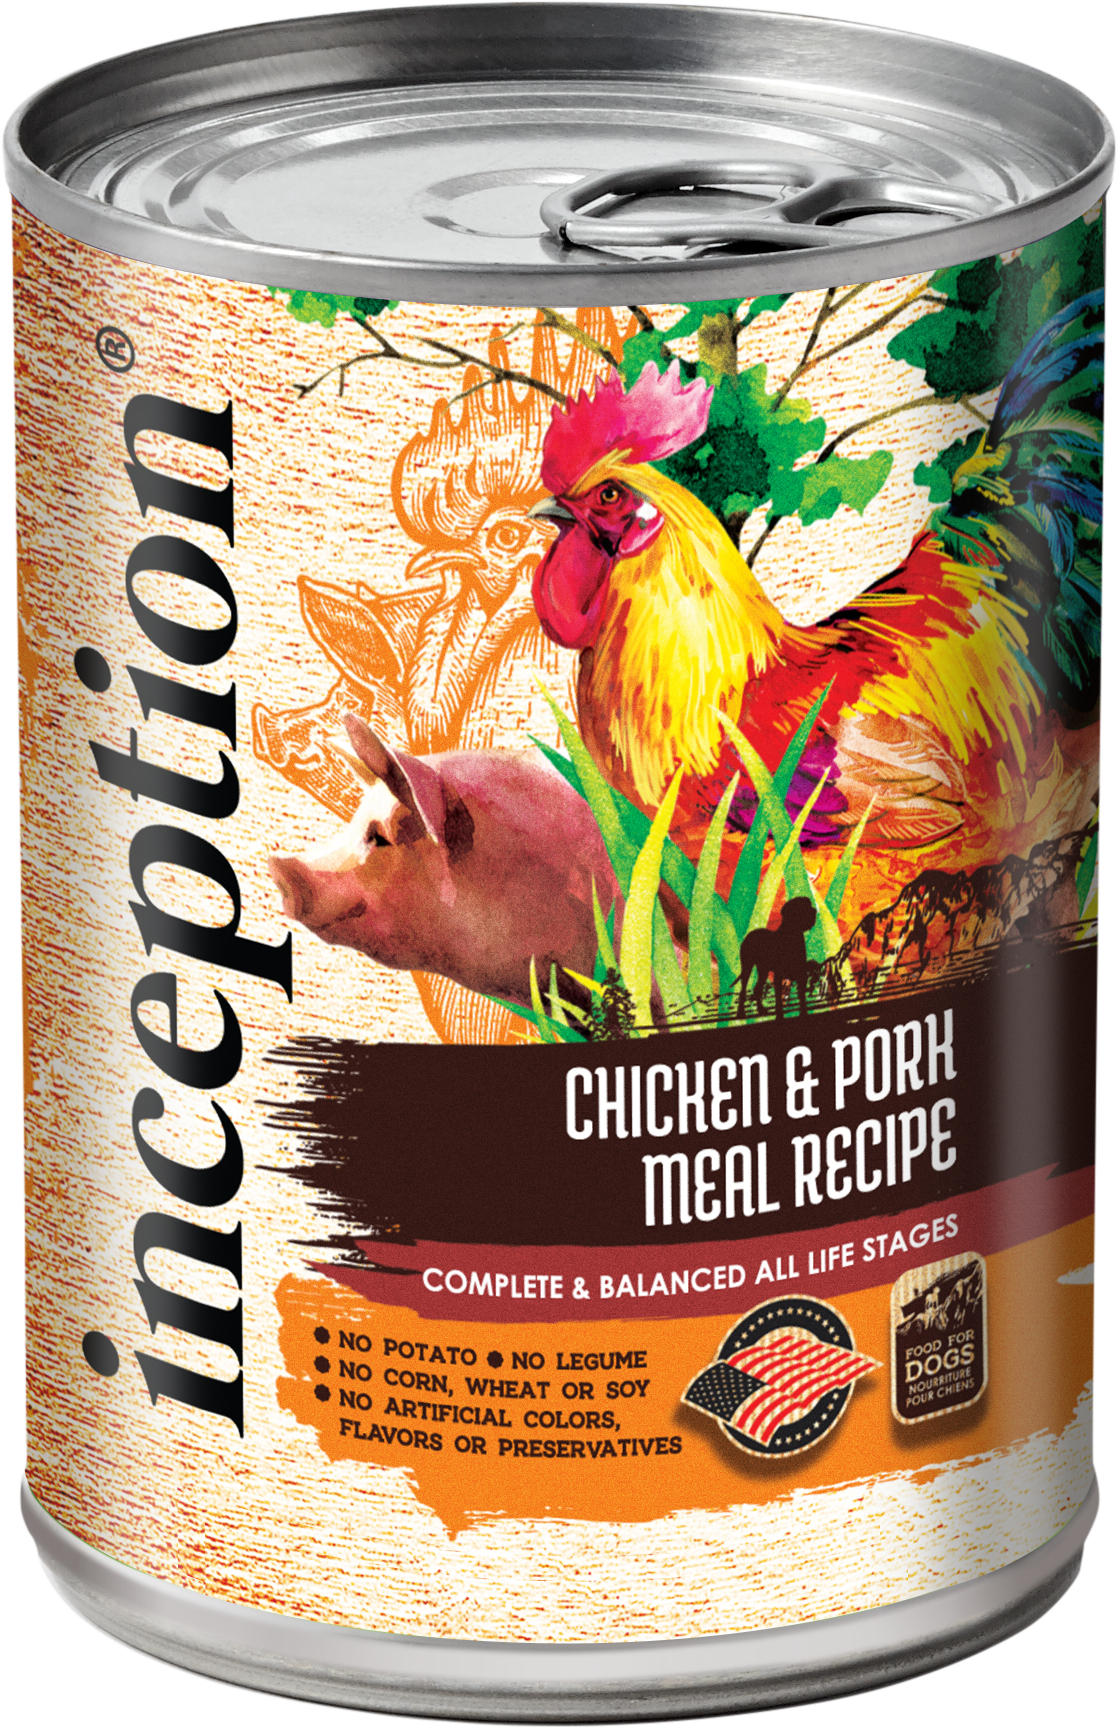 Inception Chicken & Pork Meal Recipe Wet Dog Food, 13-oz